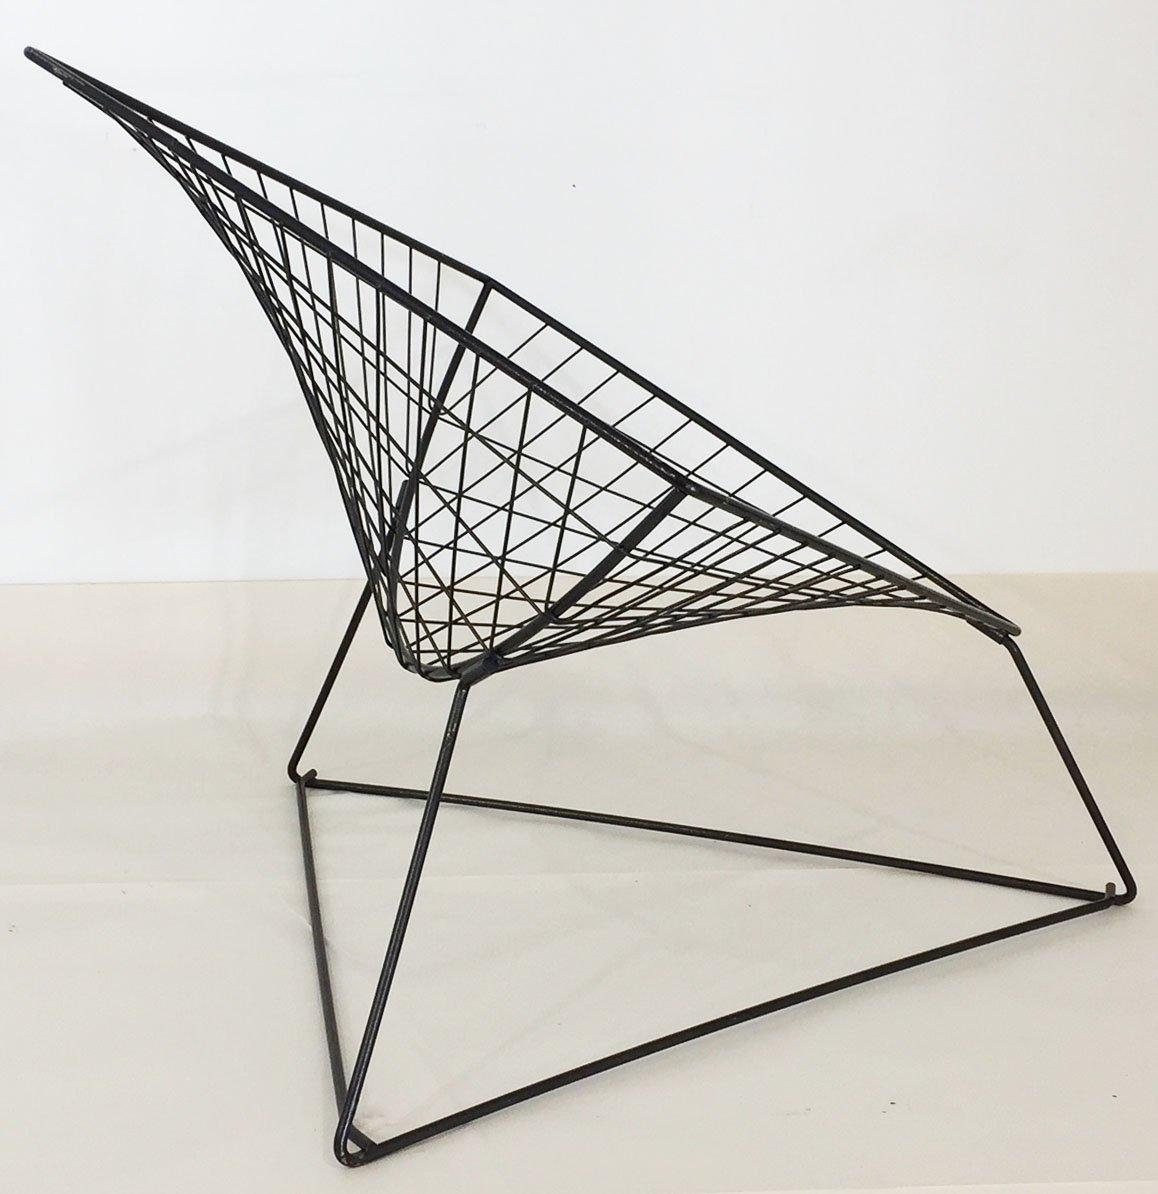 Captivating Model Oti Wire Mesh Chair By Jørgen Gammelgaard For Ikea, 1986